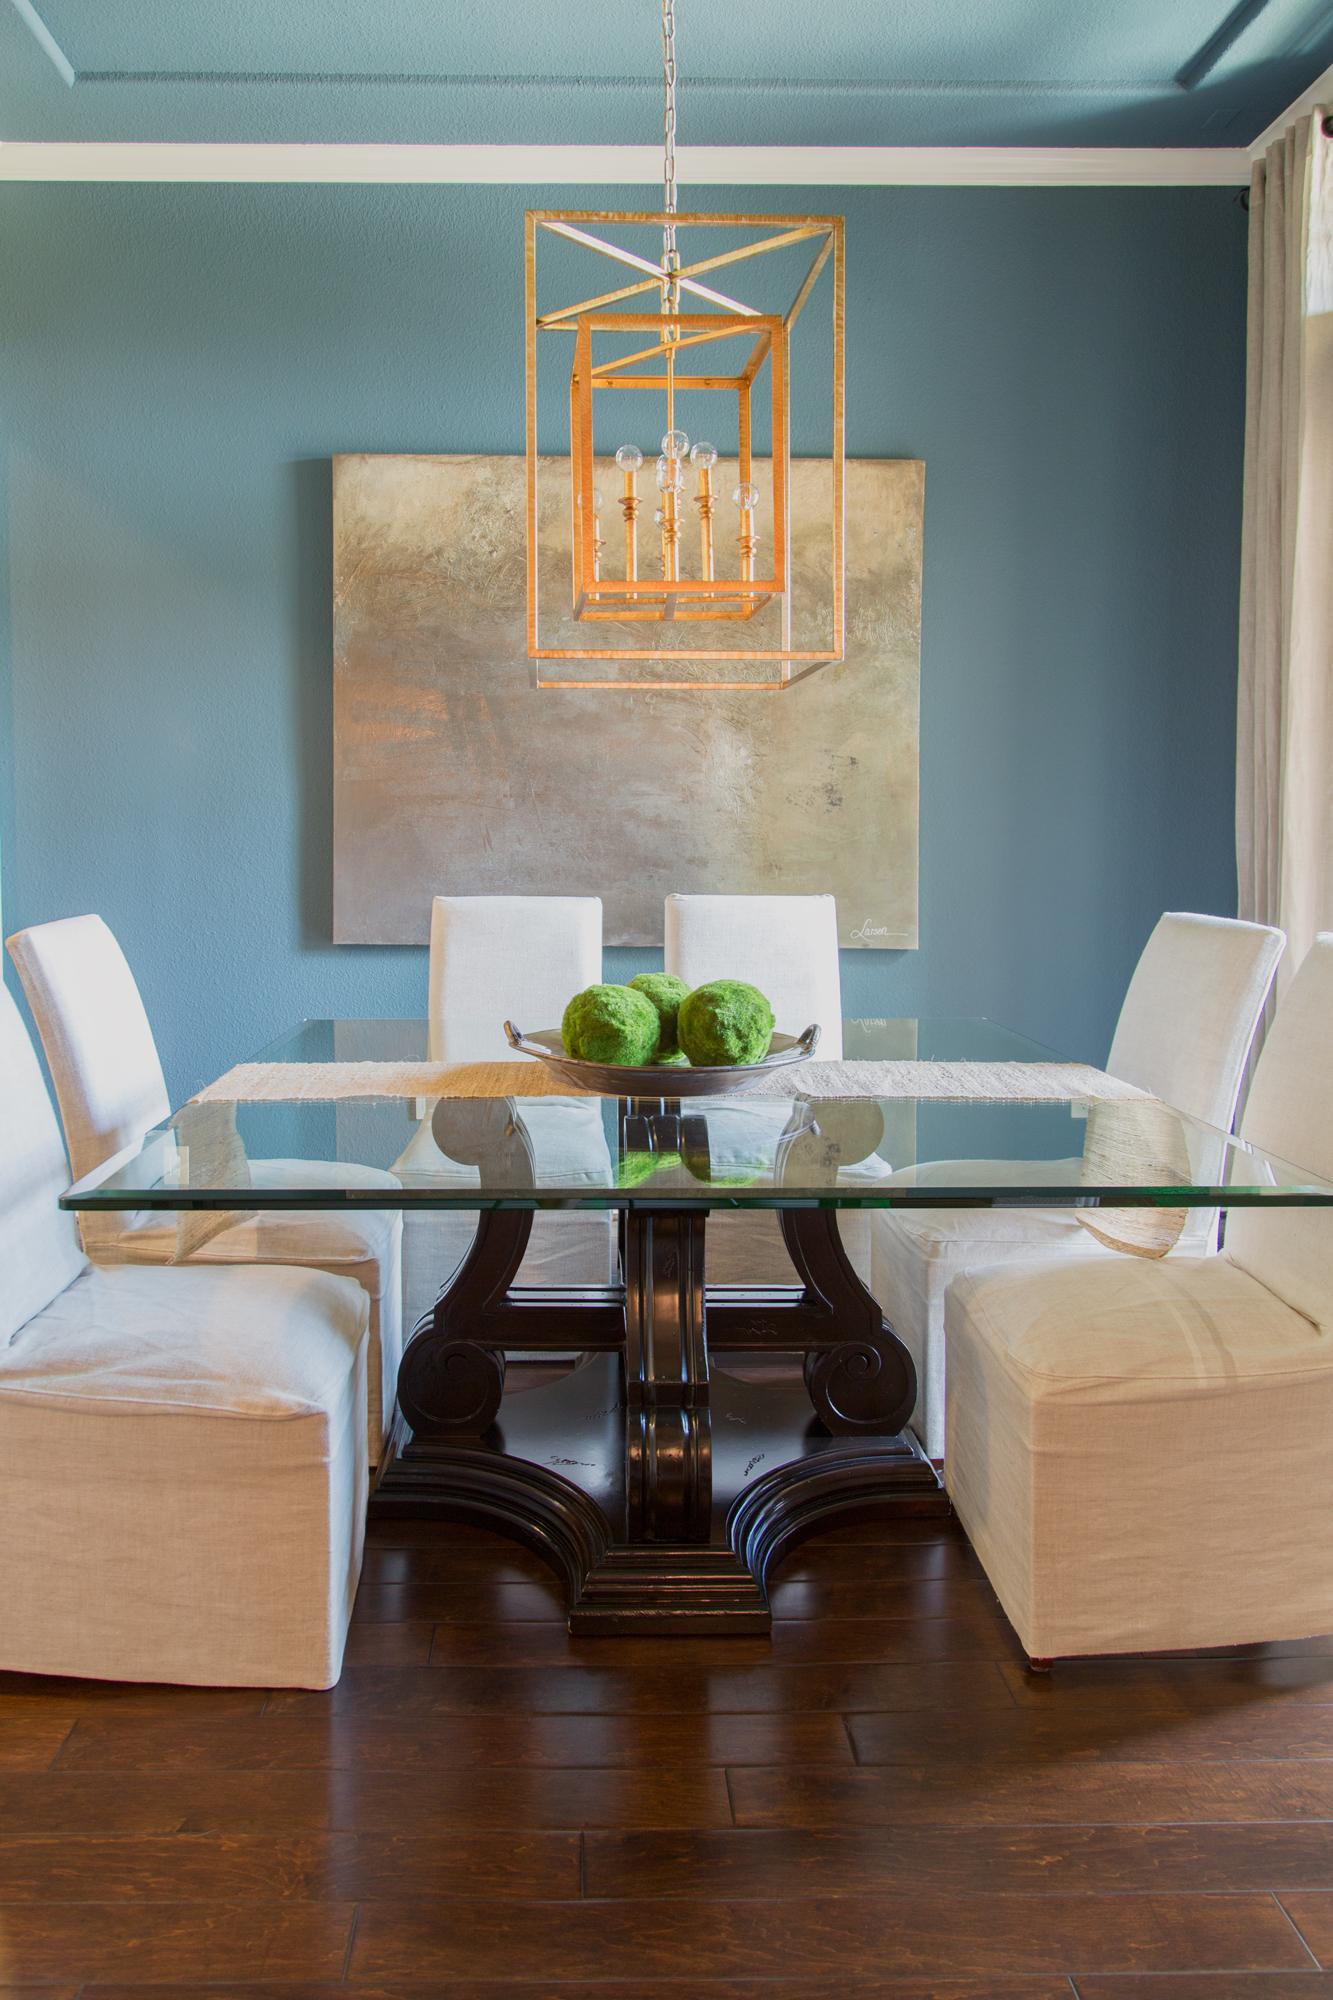 Dining room remodel; table; art; gilded lantern; decor | Interior Designer: Carla Aston / Photographer: Tori Aston